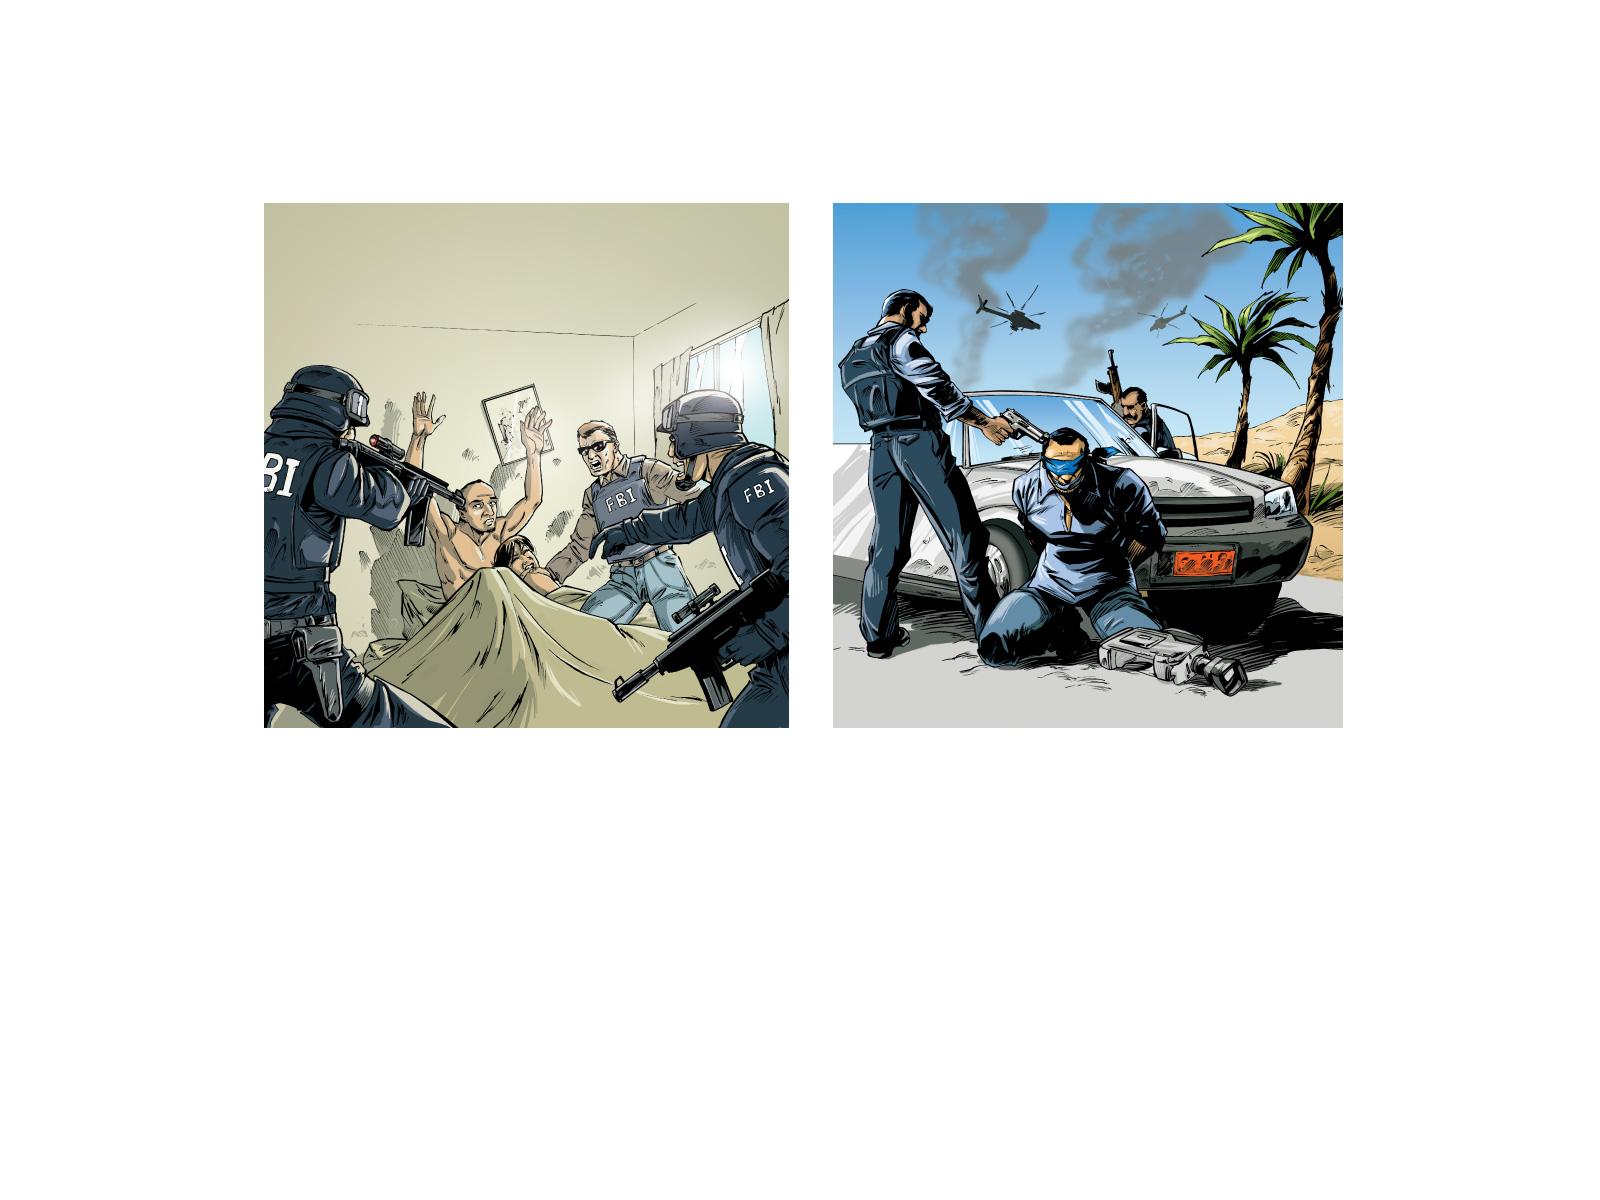 LEDISCOTOlivier-Illustrations-EDITIONS-3132